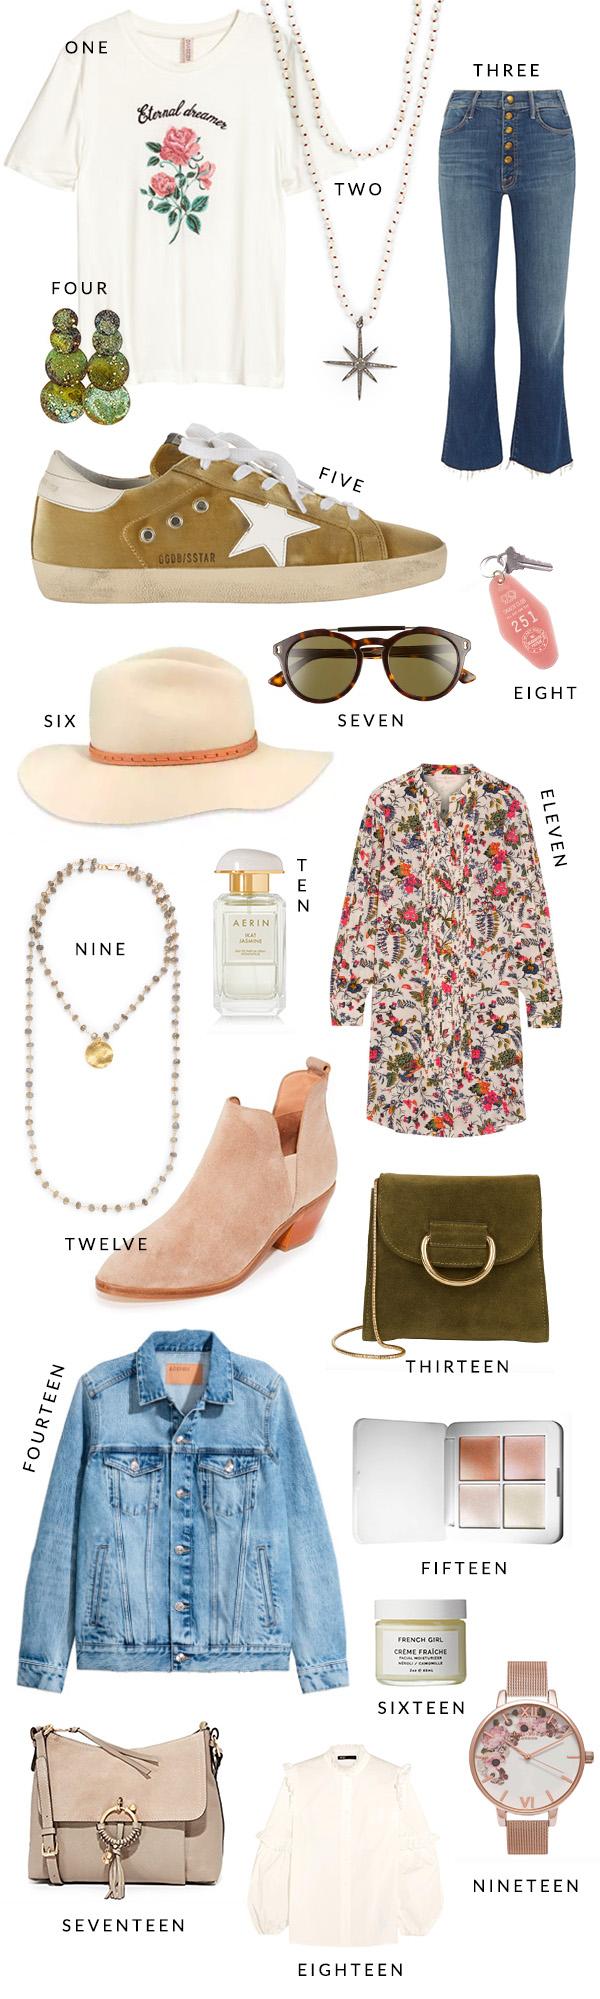 Fall essentials and 70s revival fashion on waitingonmartha.com